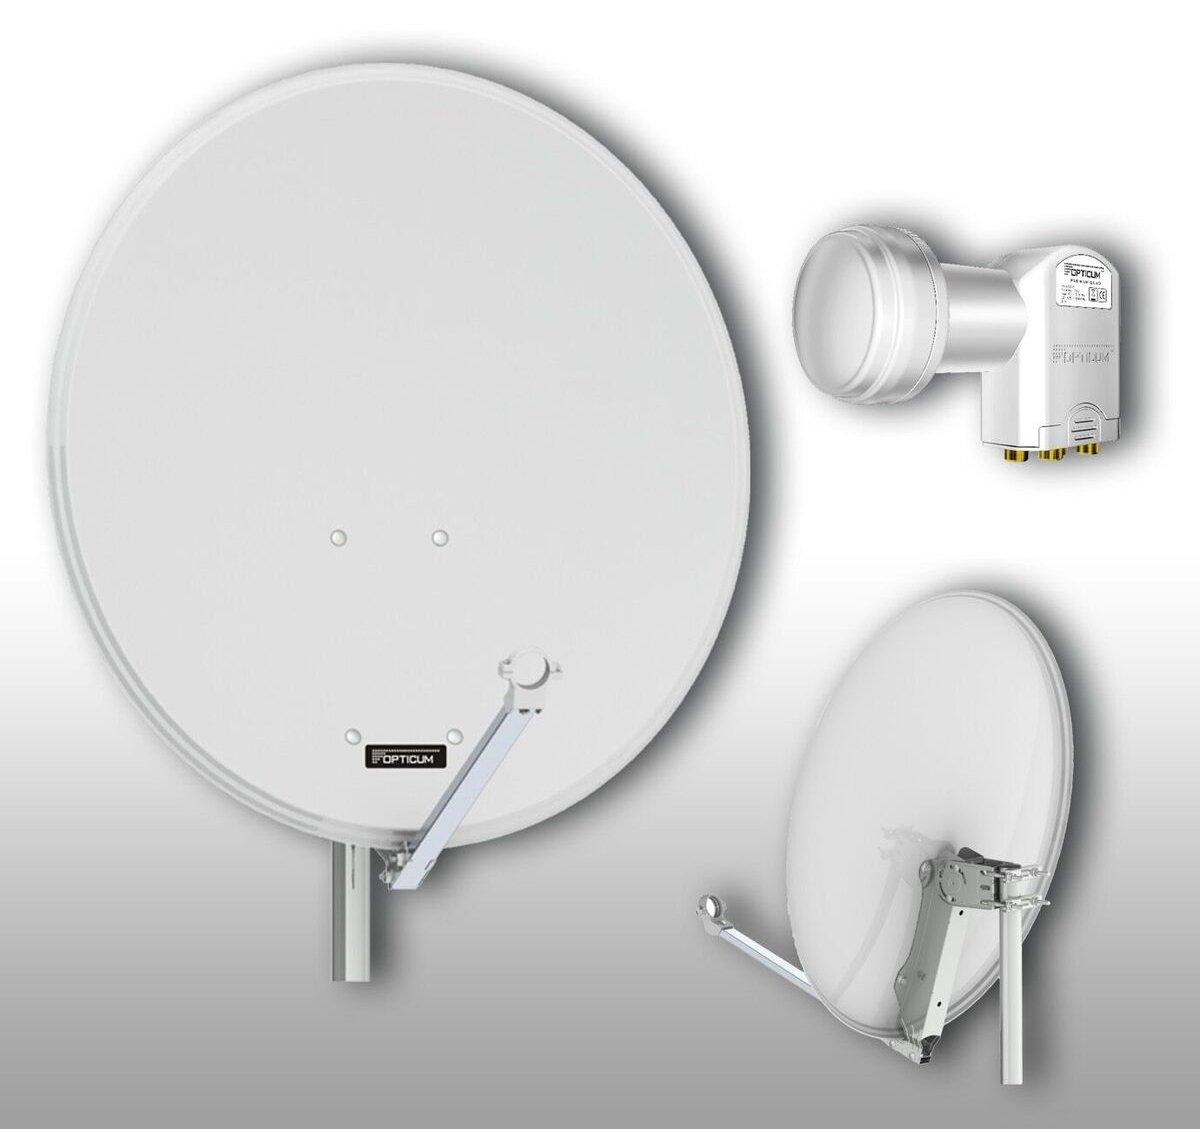 Antracite Opticum QA80 Antenna satellitare in alluminio con Twin LNB